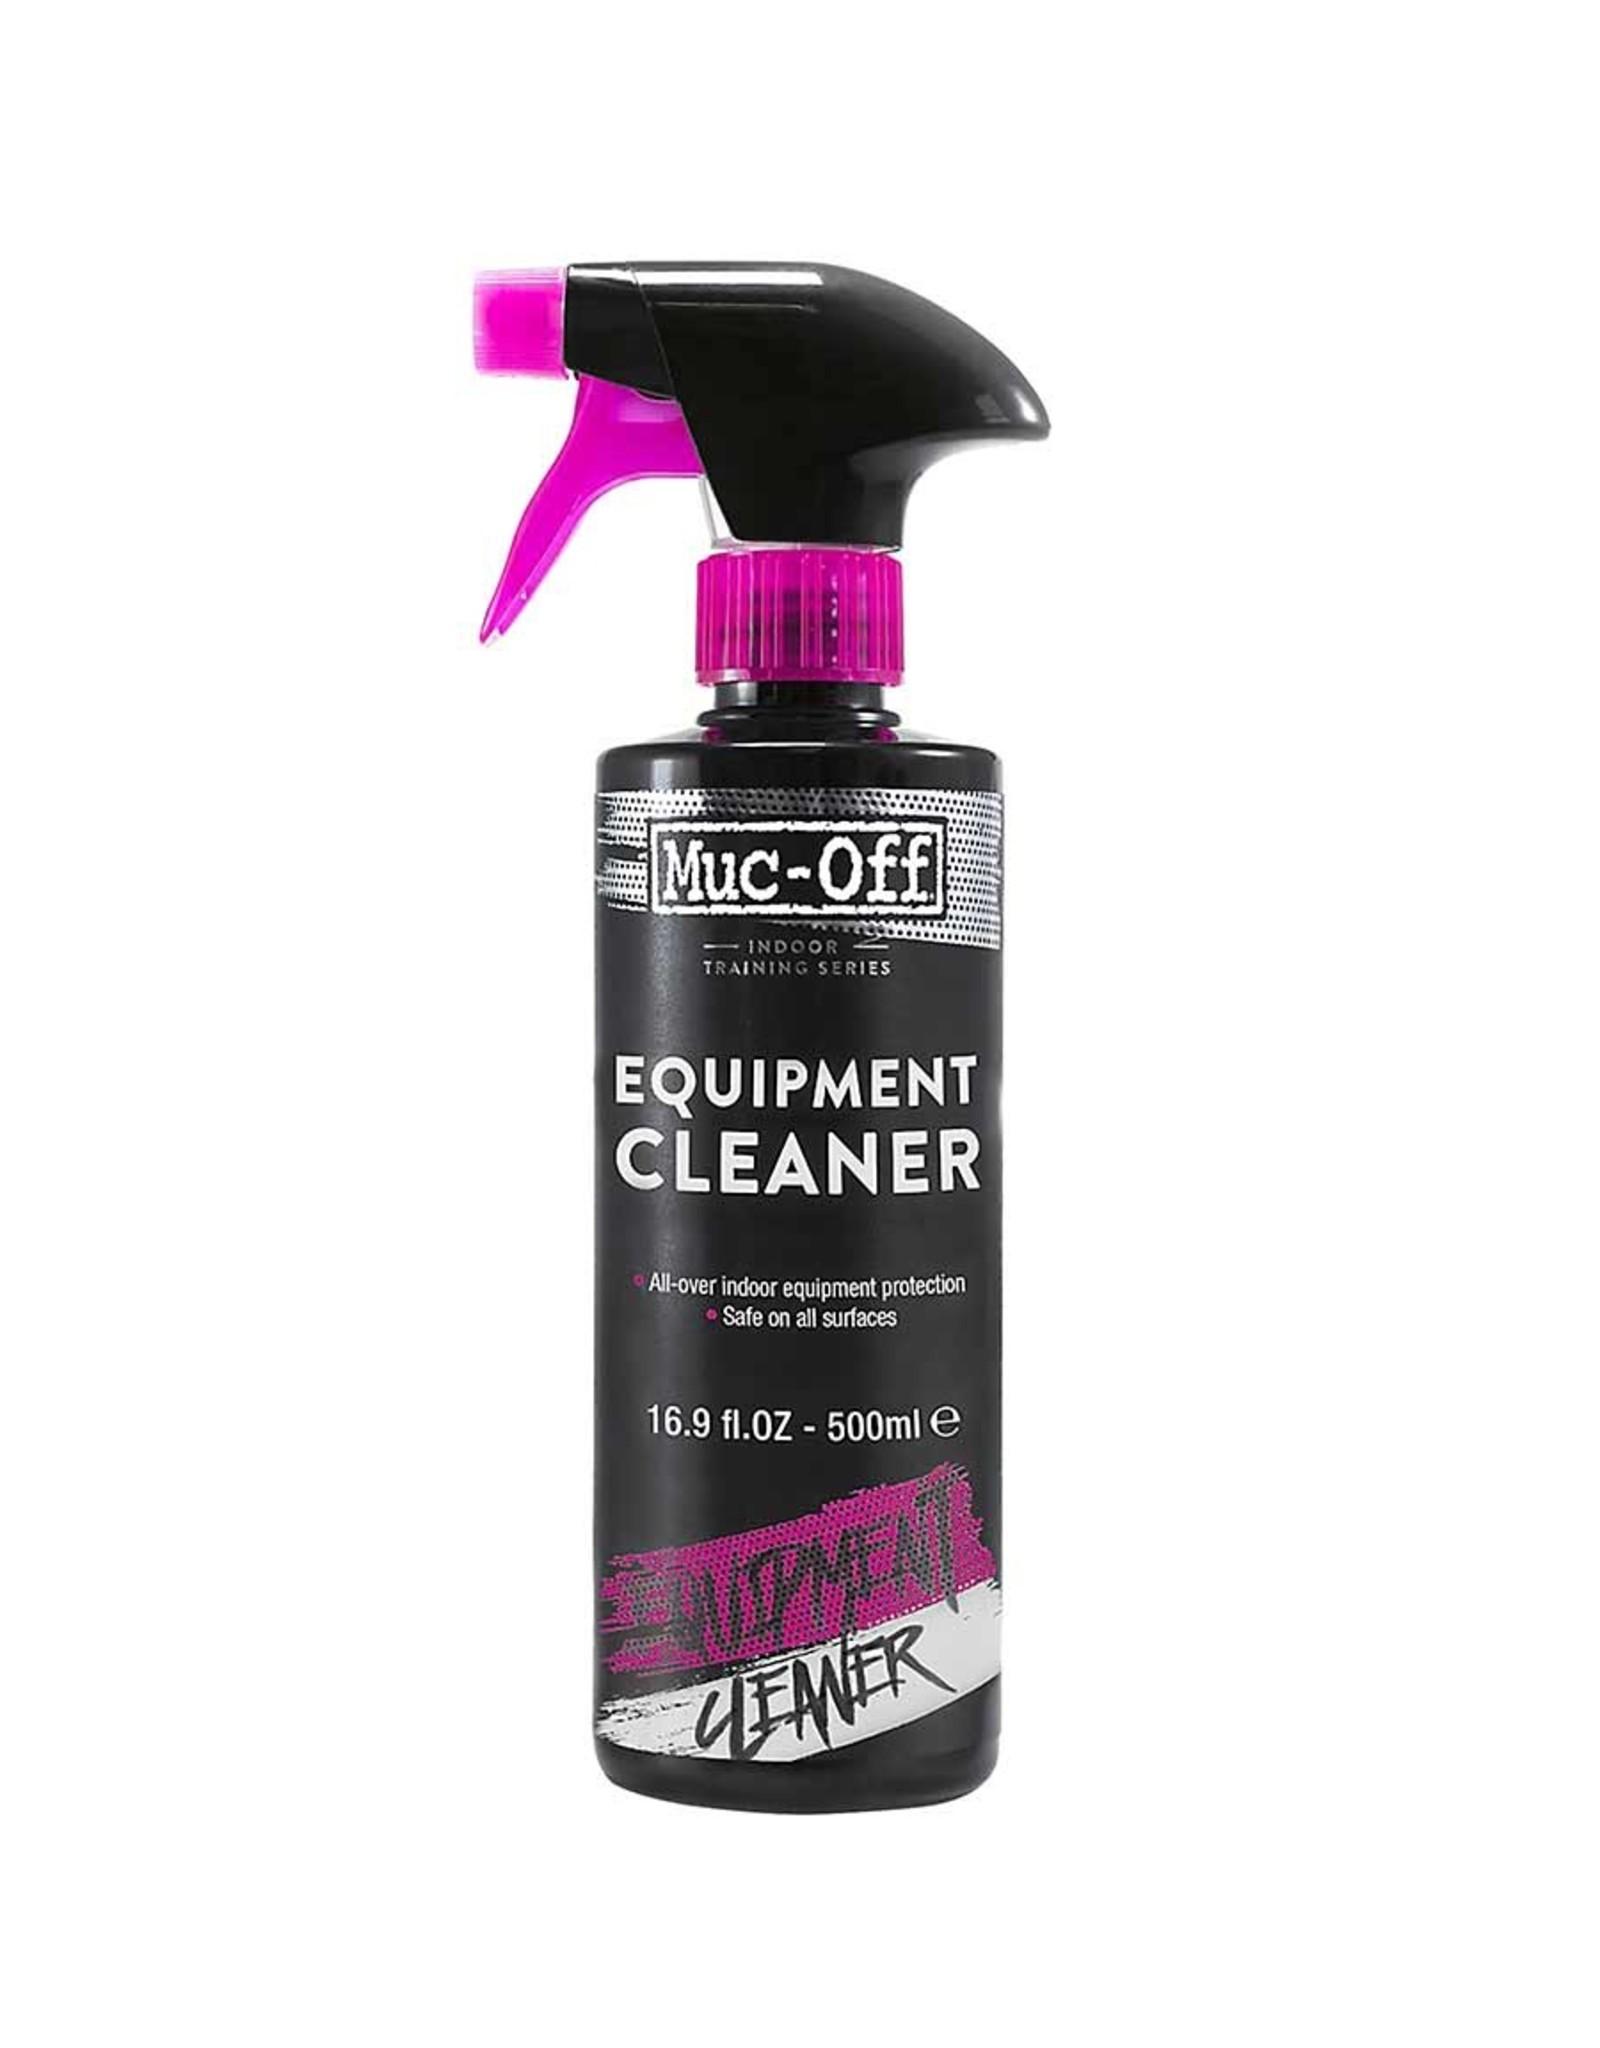 Muc-Off Equipment Cleaner, 500ml